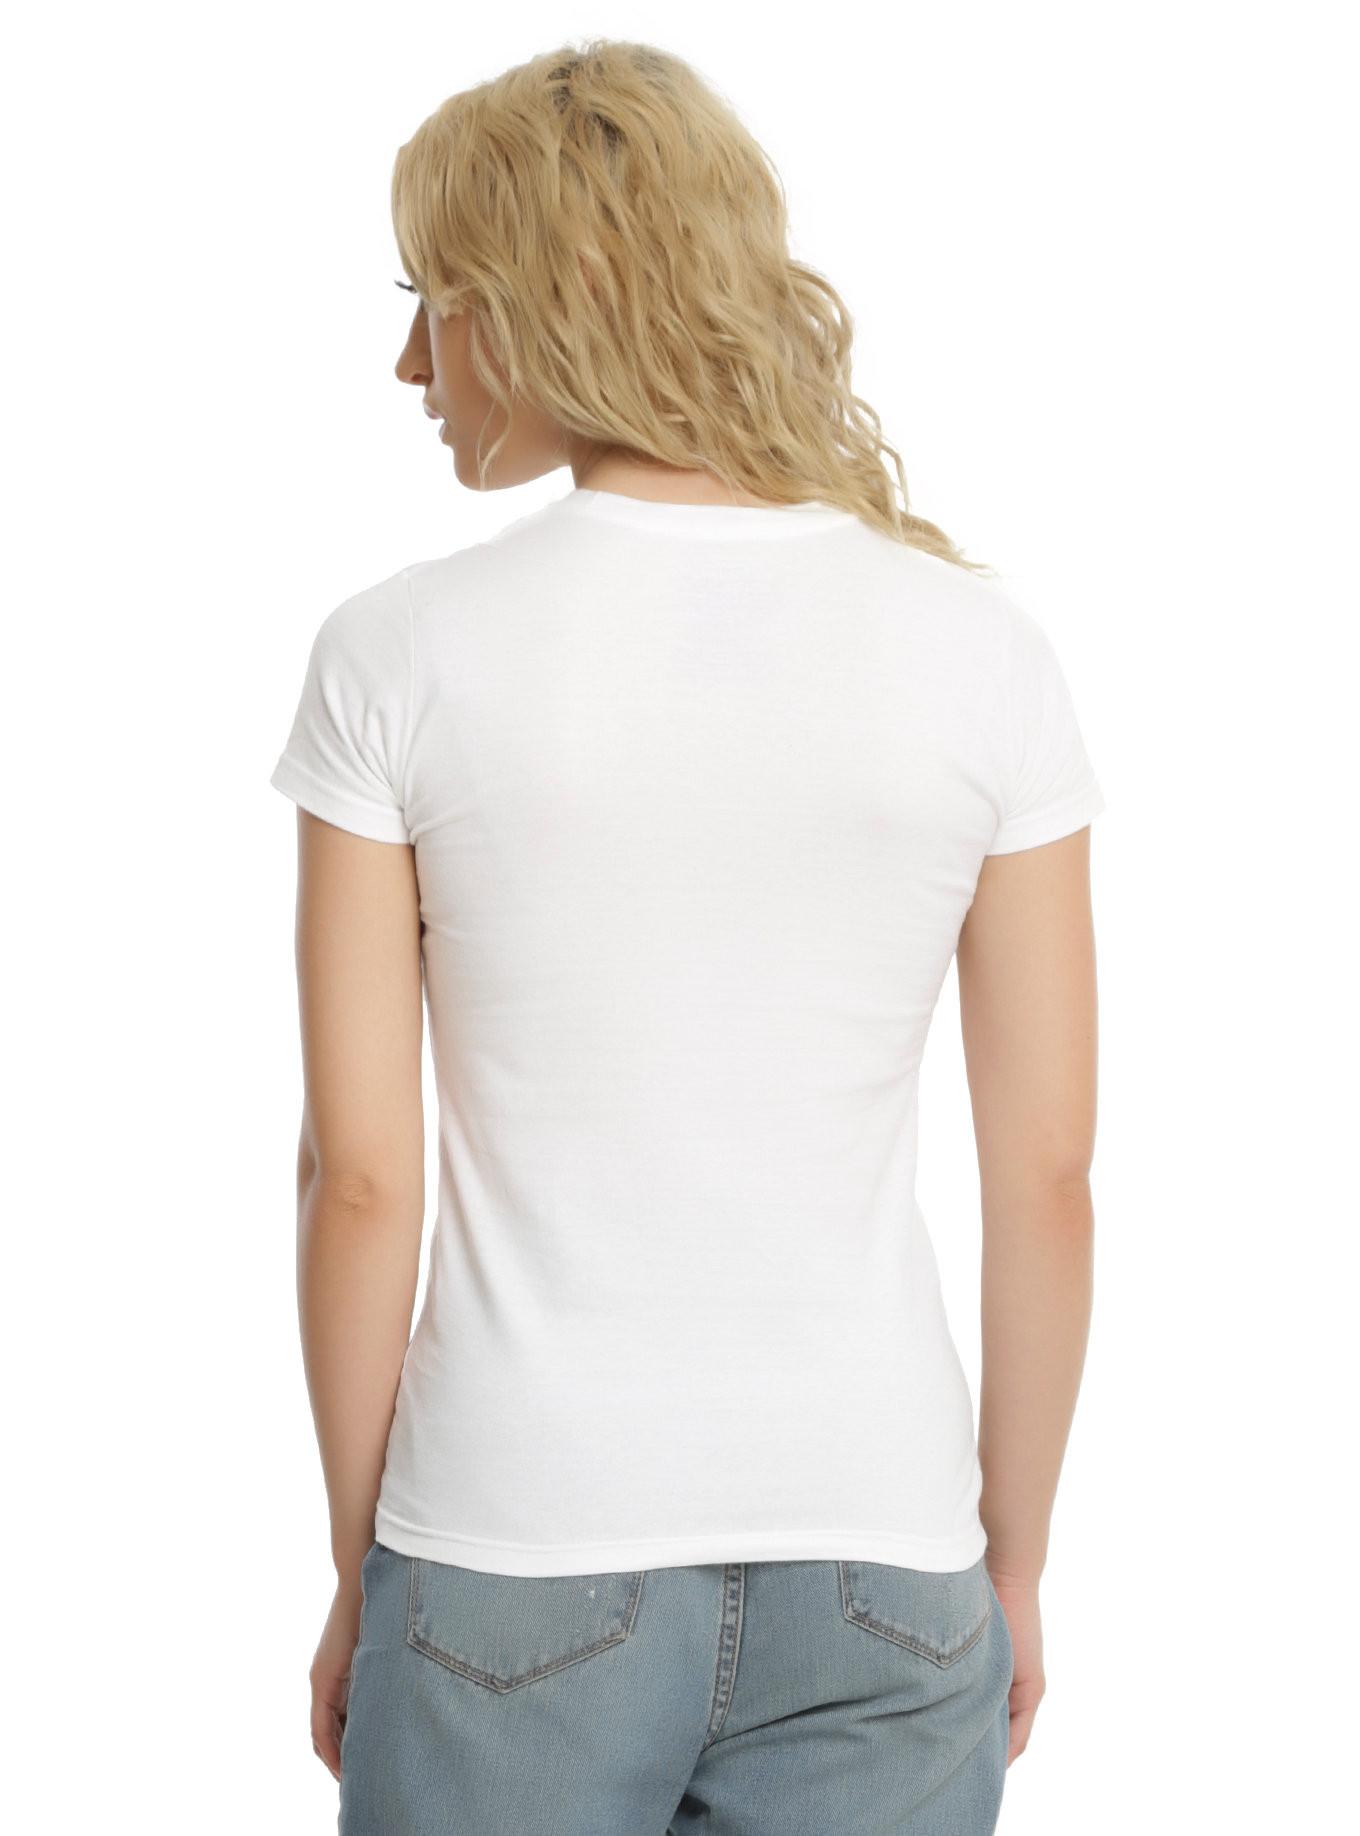 New women's Princess Leia t-shirt at Hot Topic - The ... Old Princess Leia Shirts